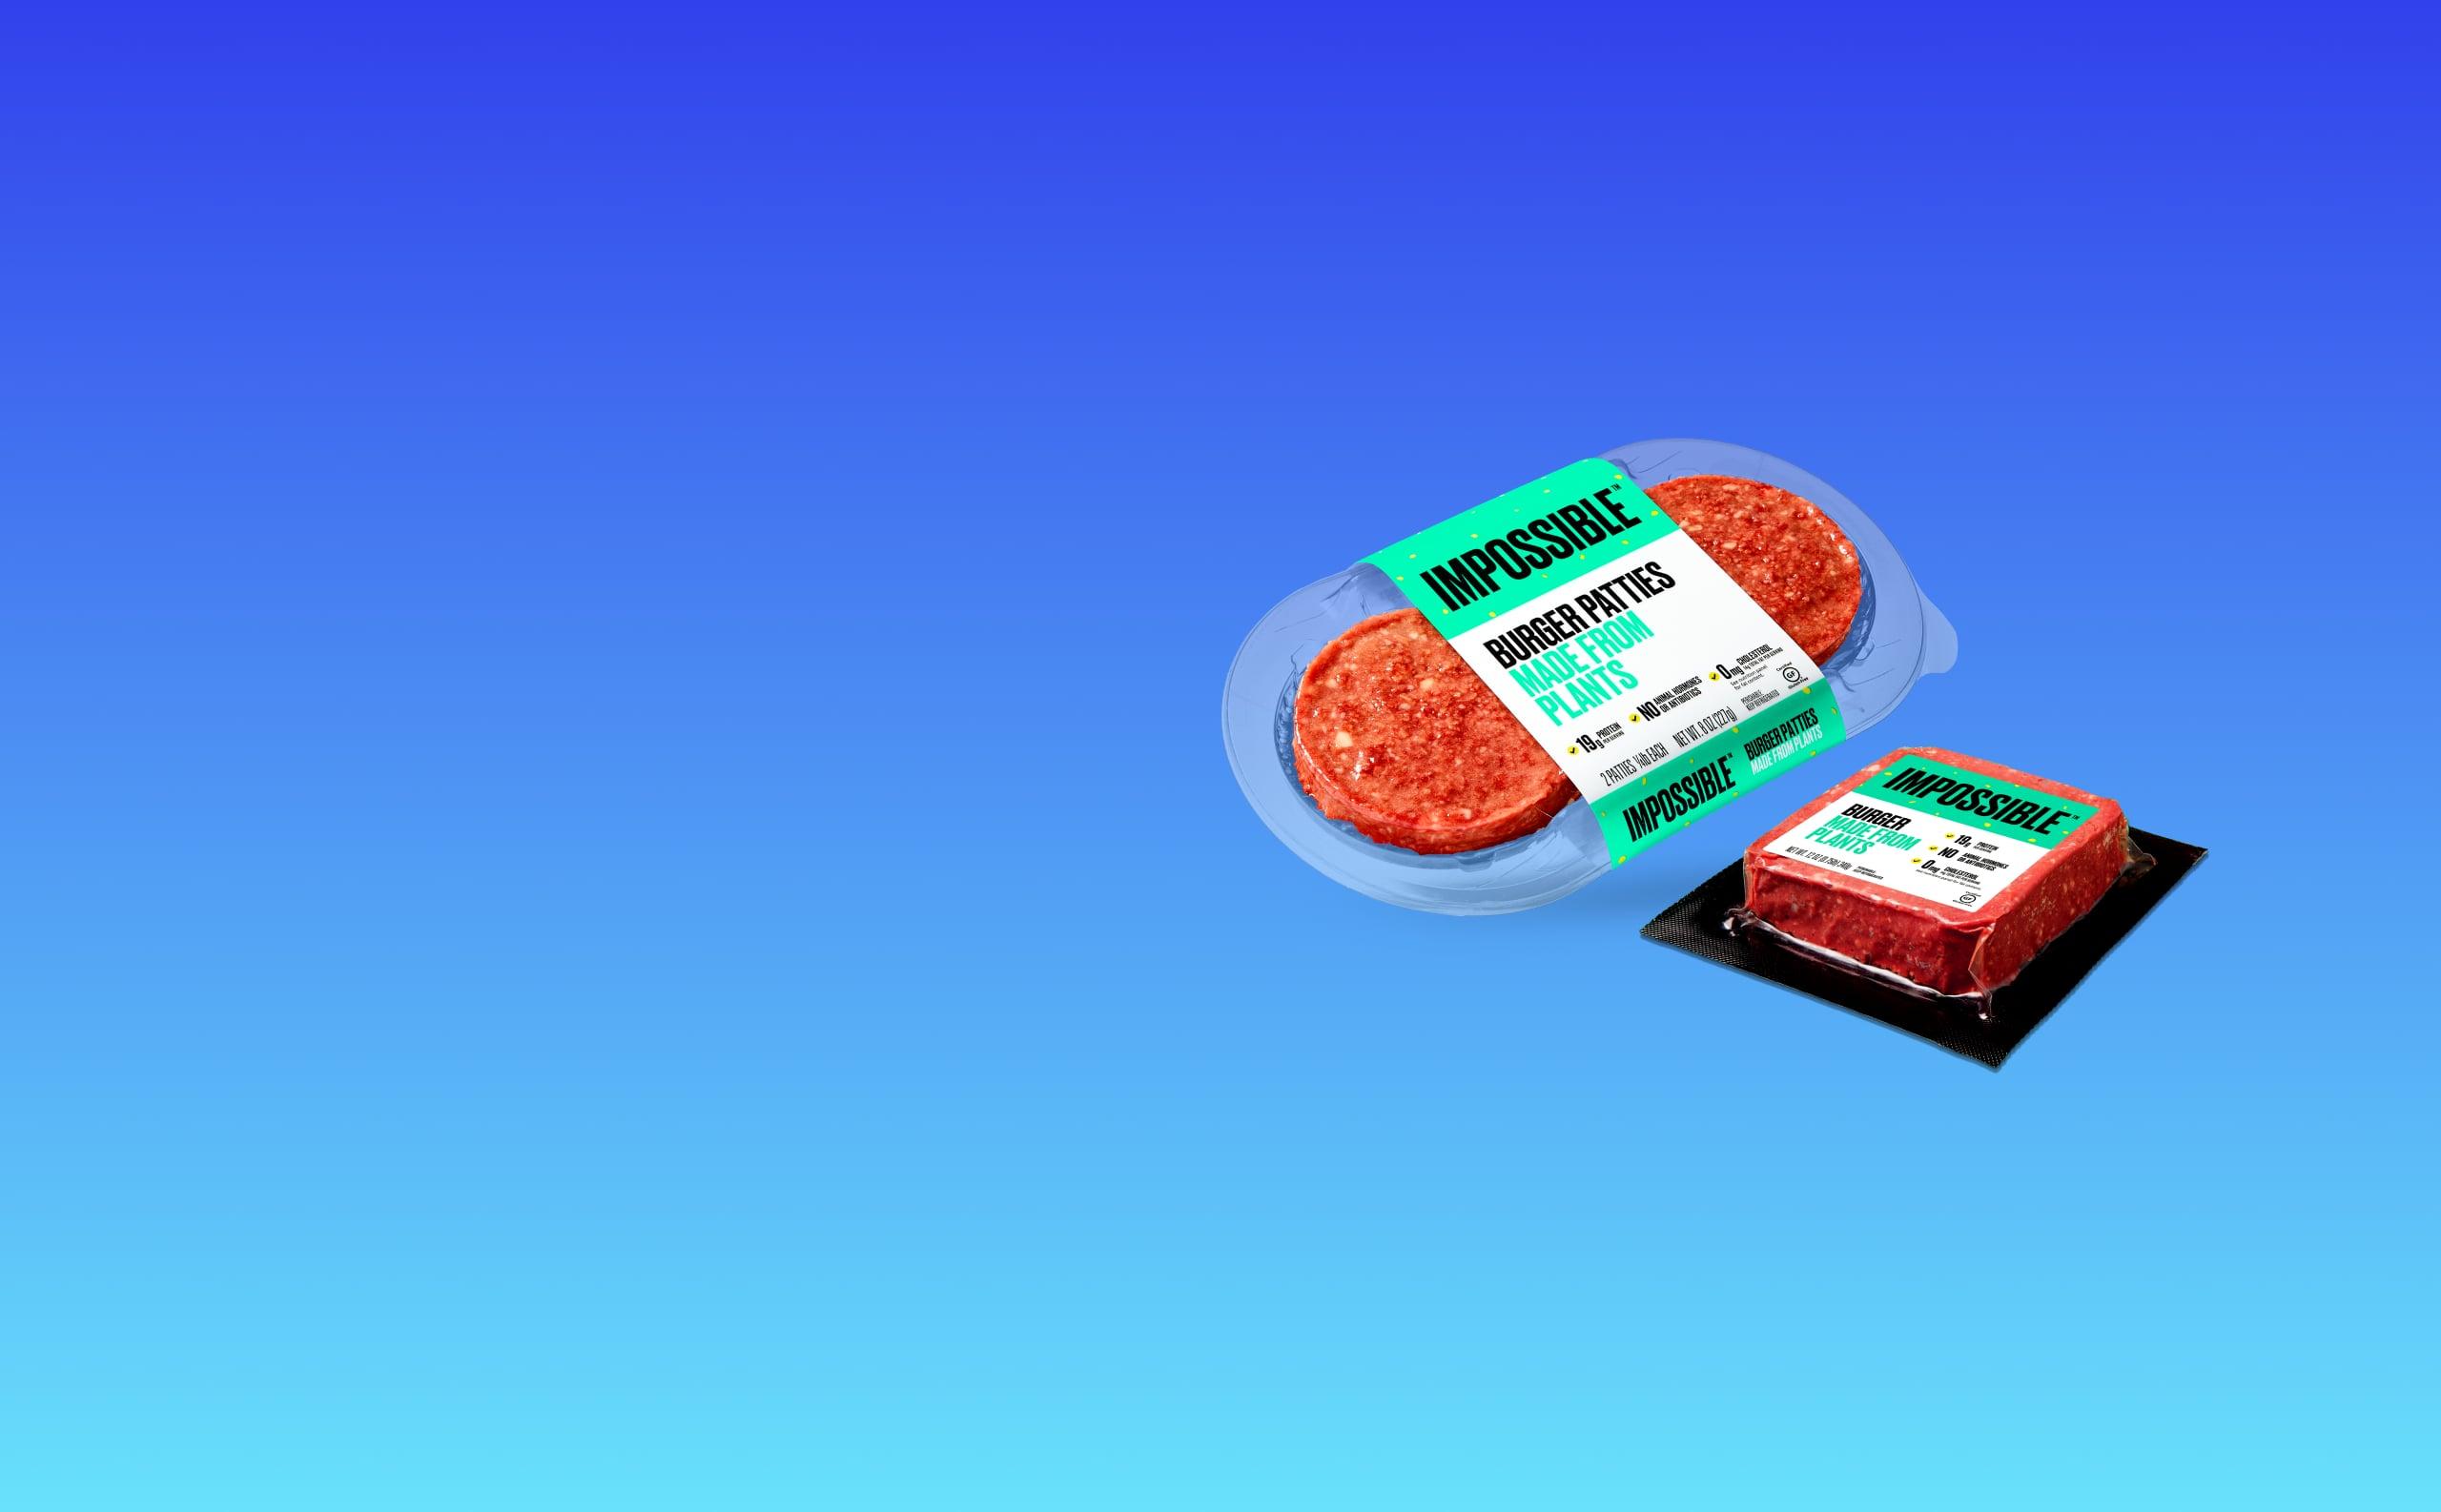 01_Retailer_Hub_Impossible_Burger_Grocery_Brick_Patties_Blue_Hero_2560x1586